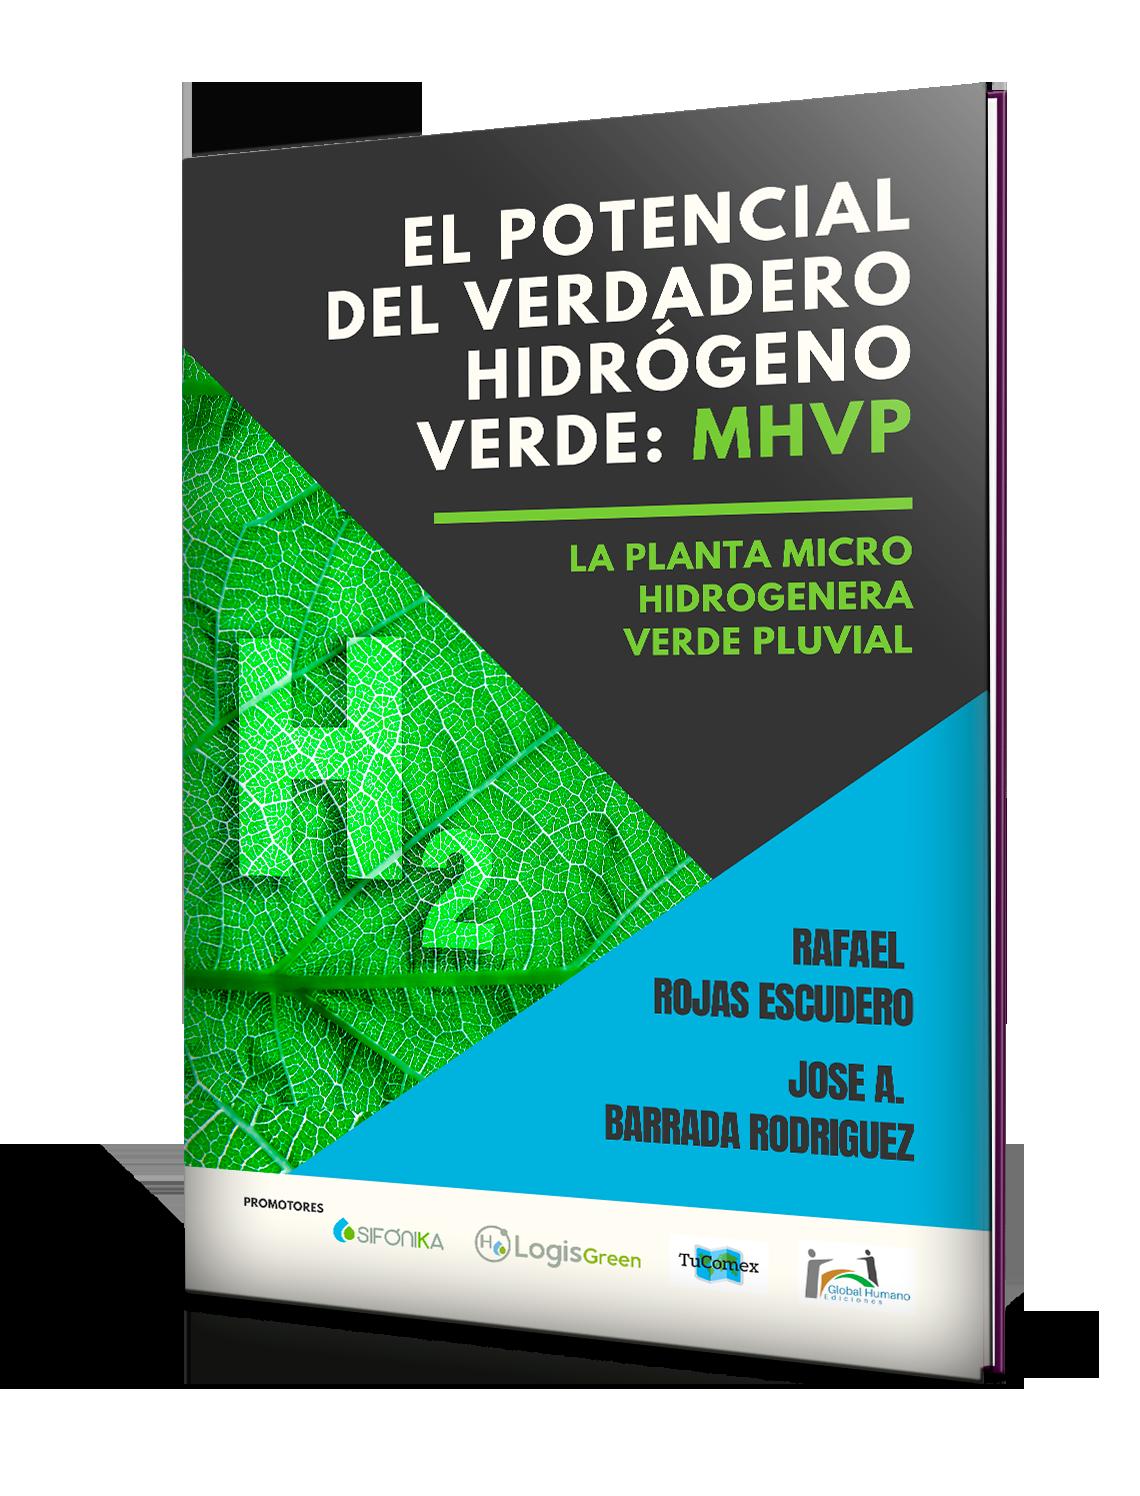 Hidrógeno Verde Pluvial |MHVP